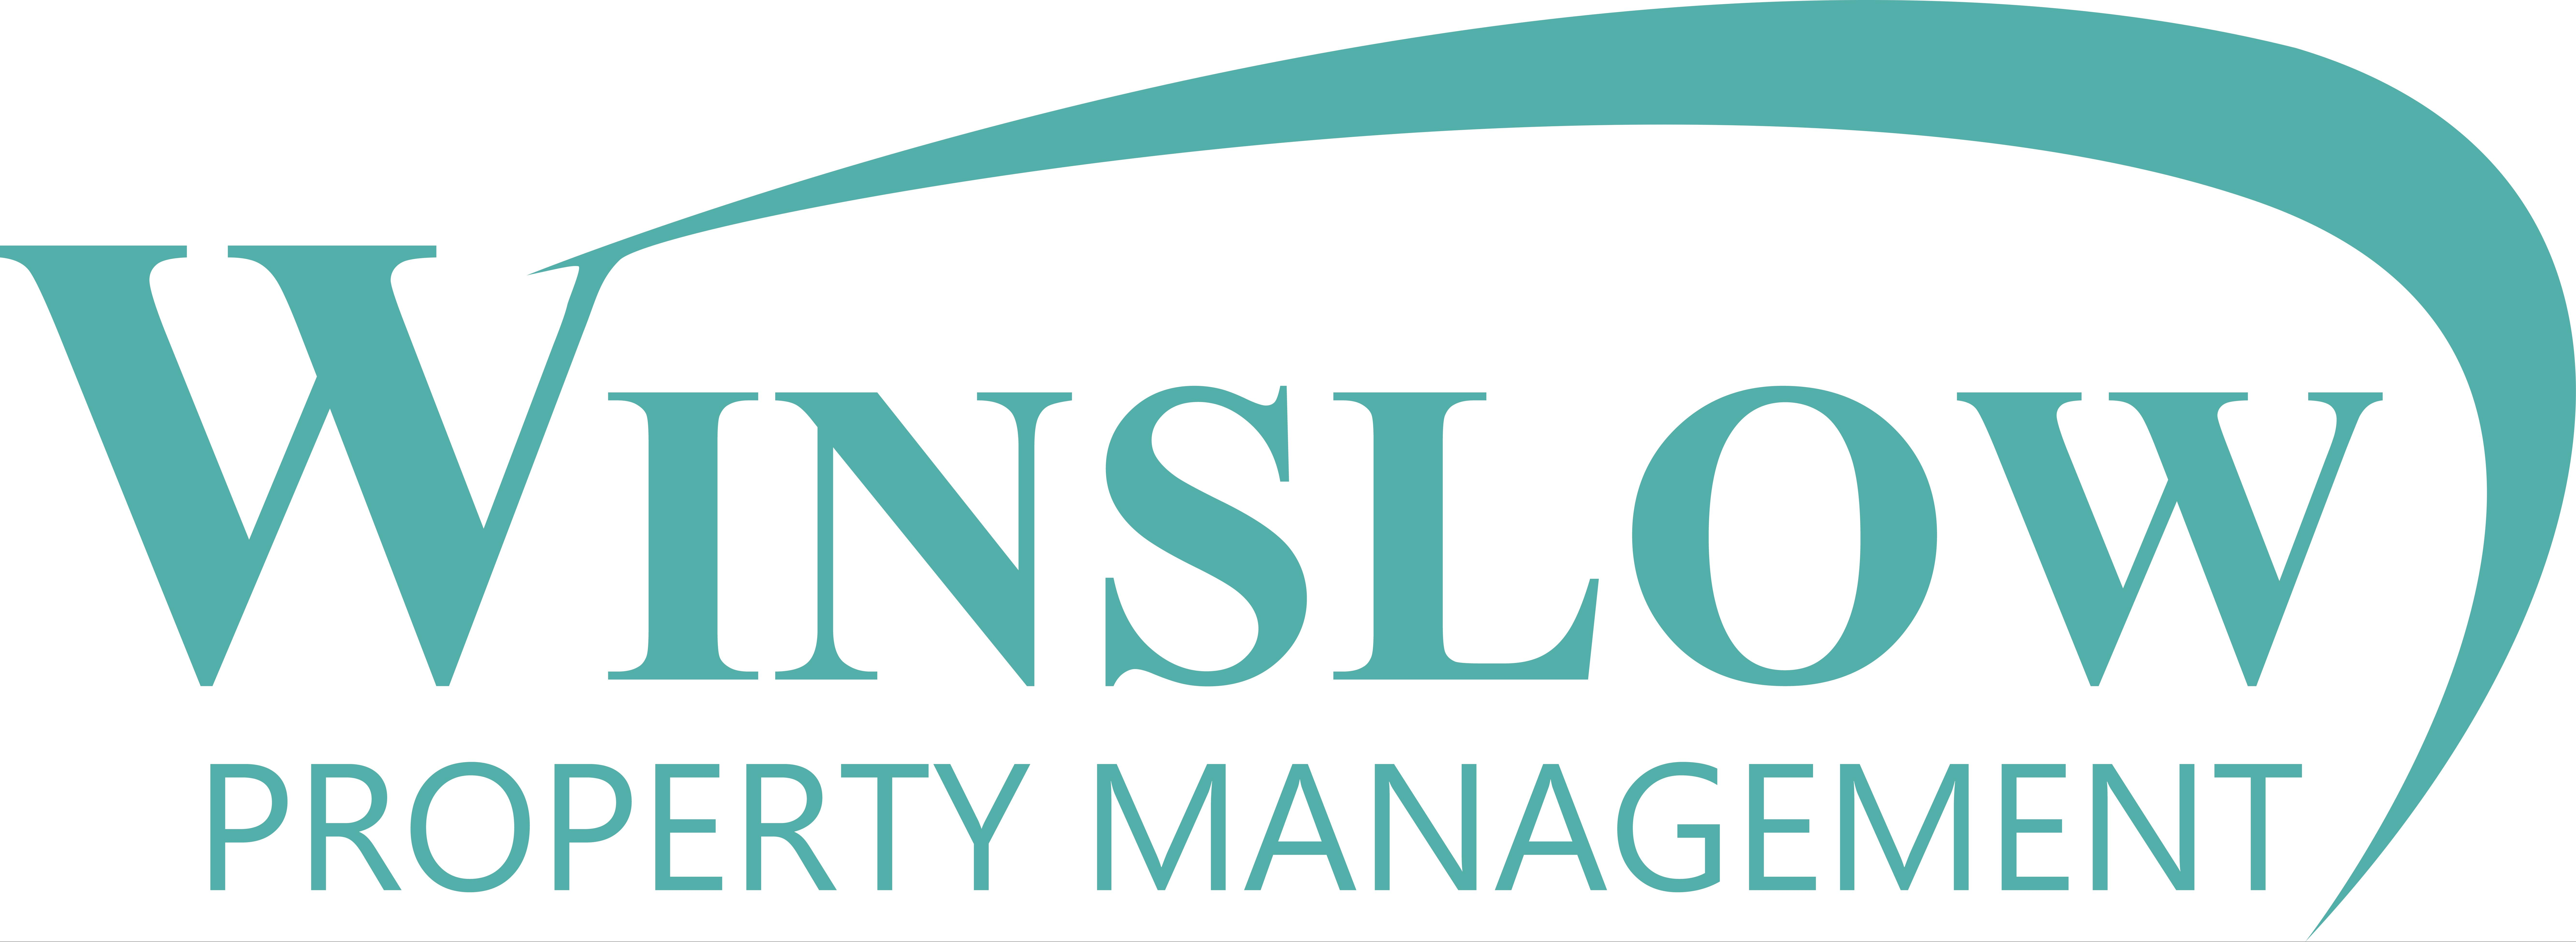 Winslow Property Management